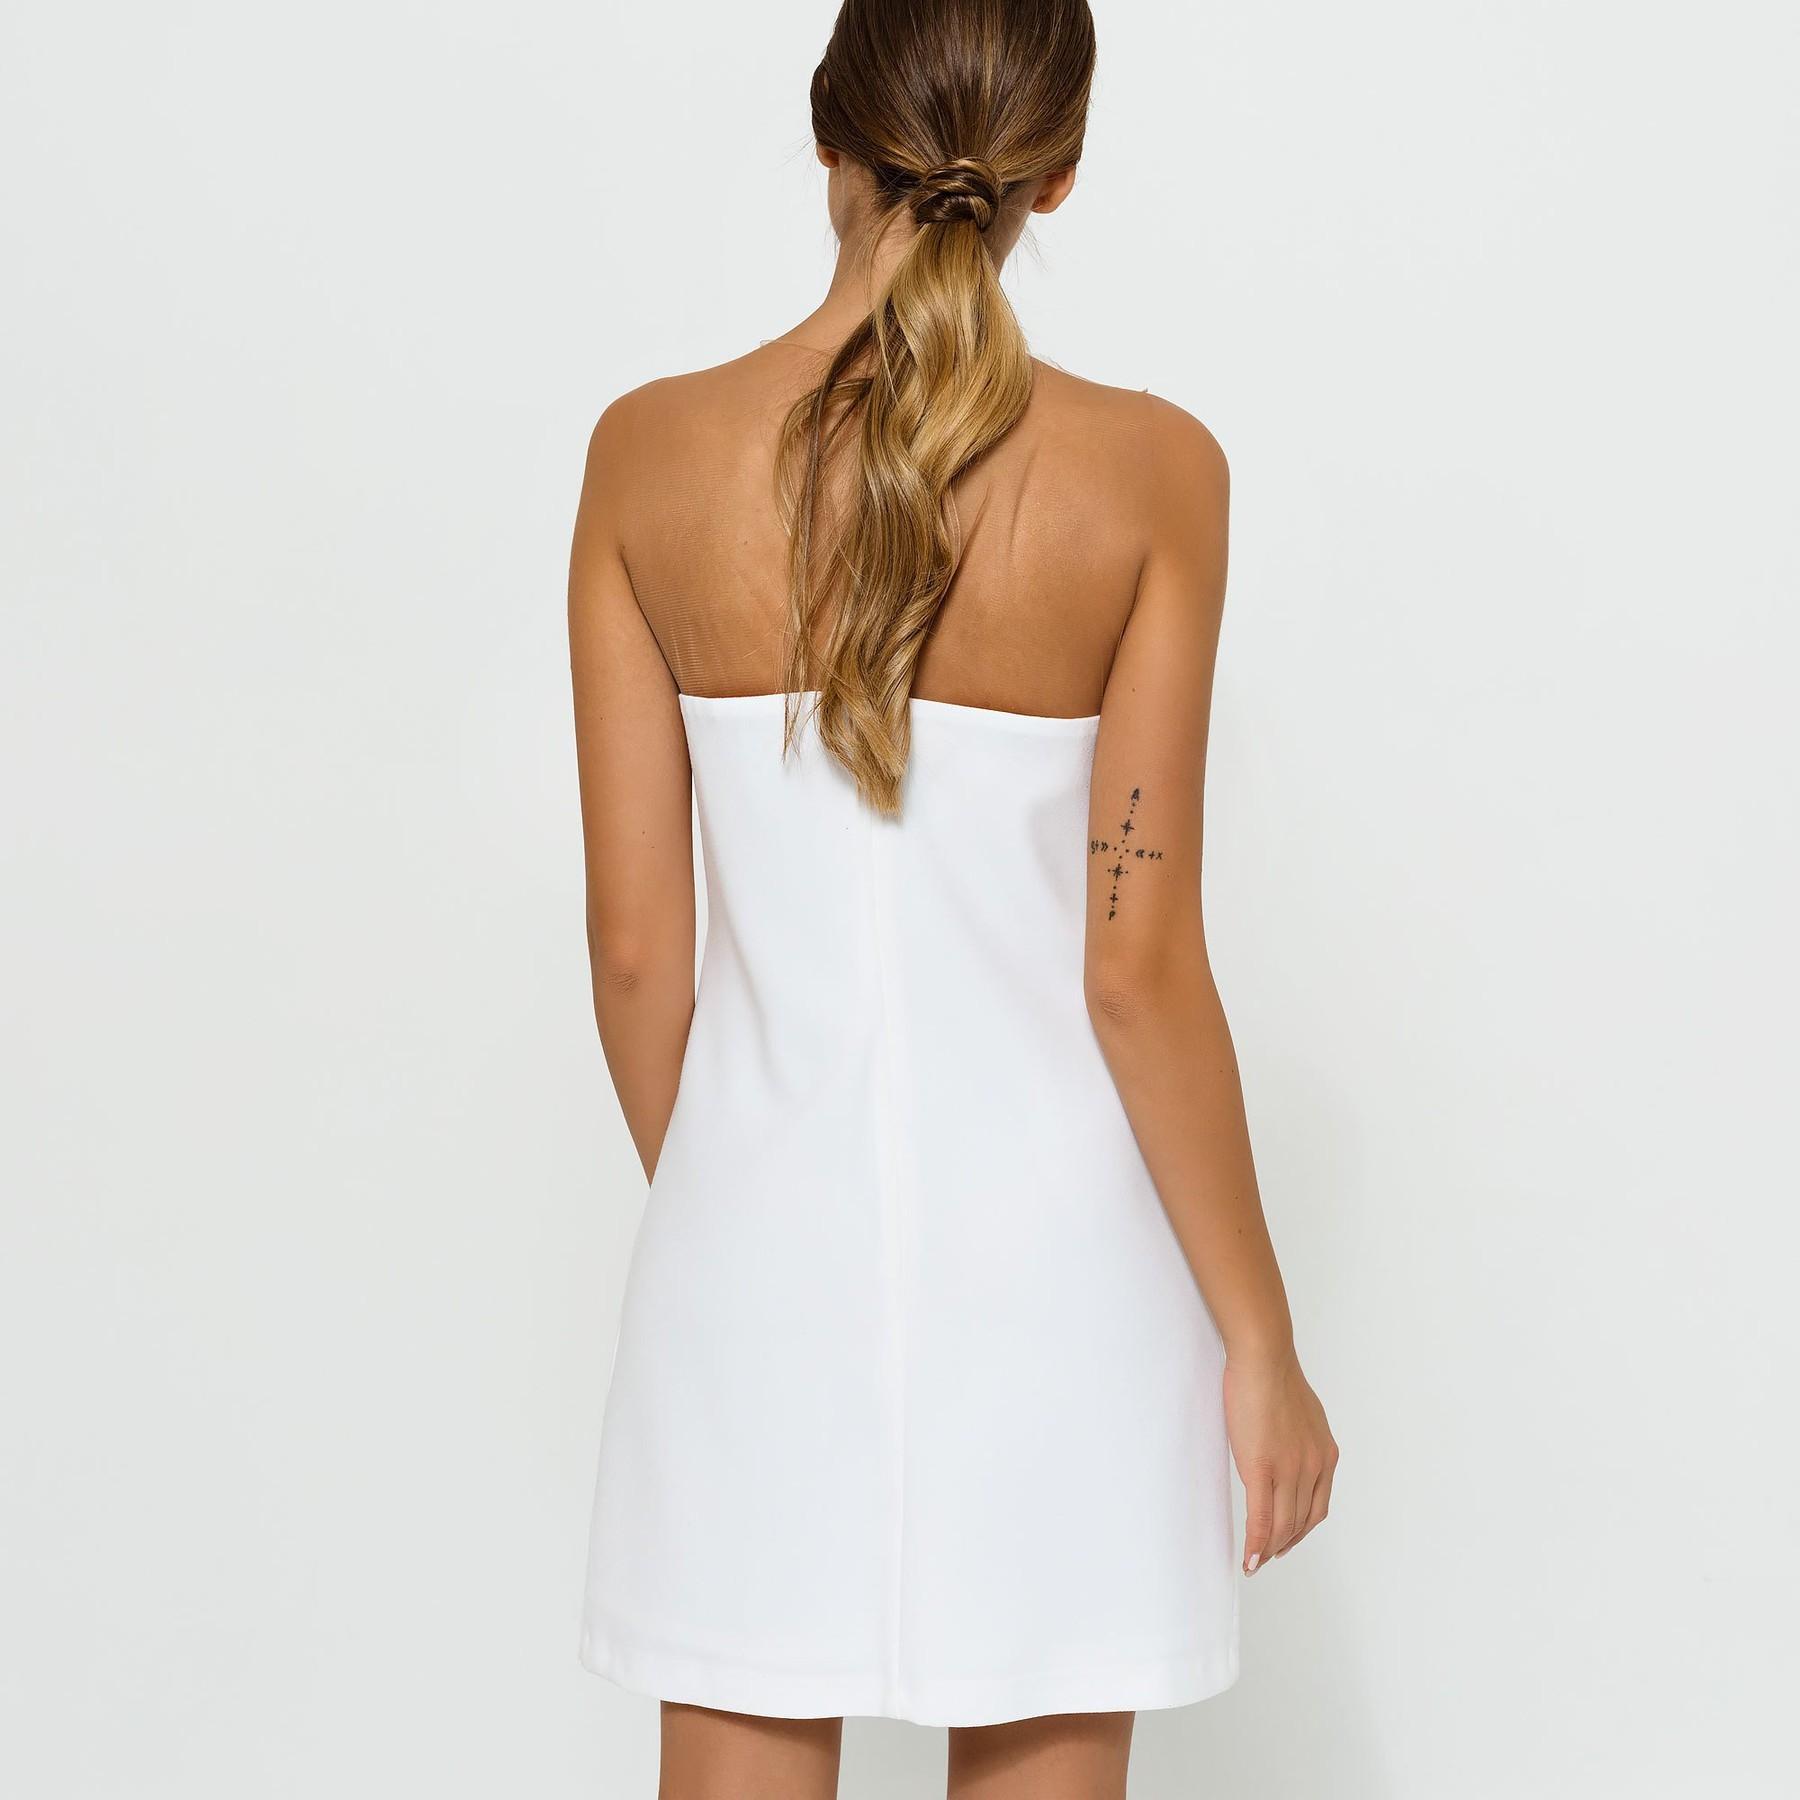 Ivory Dress with Glitter Stripes